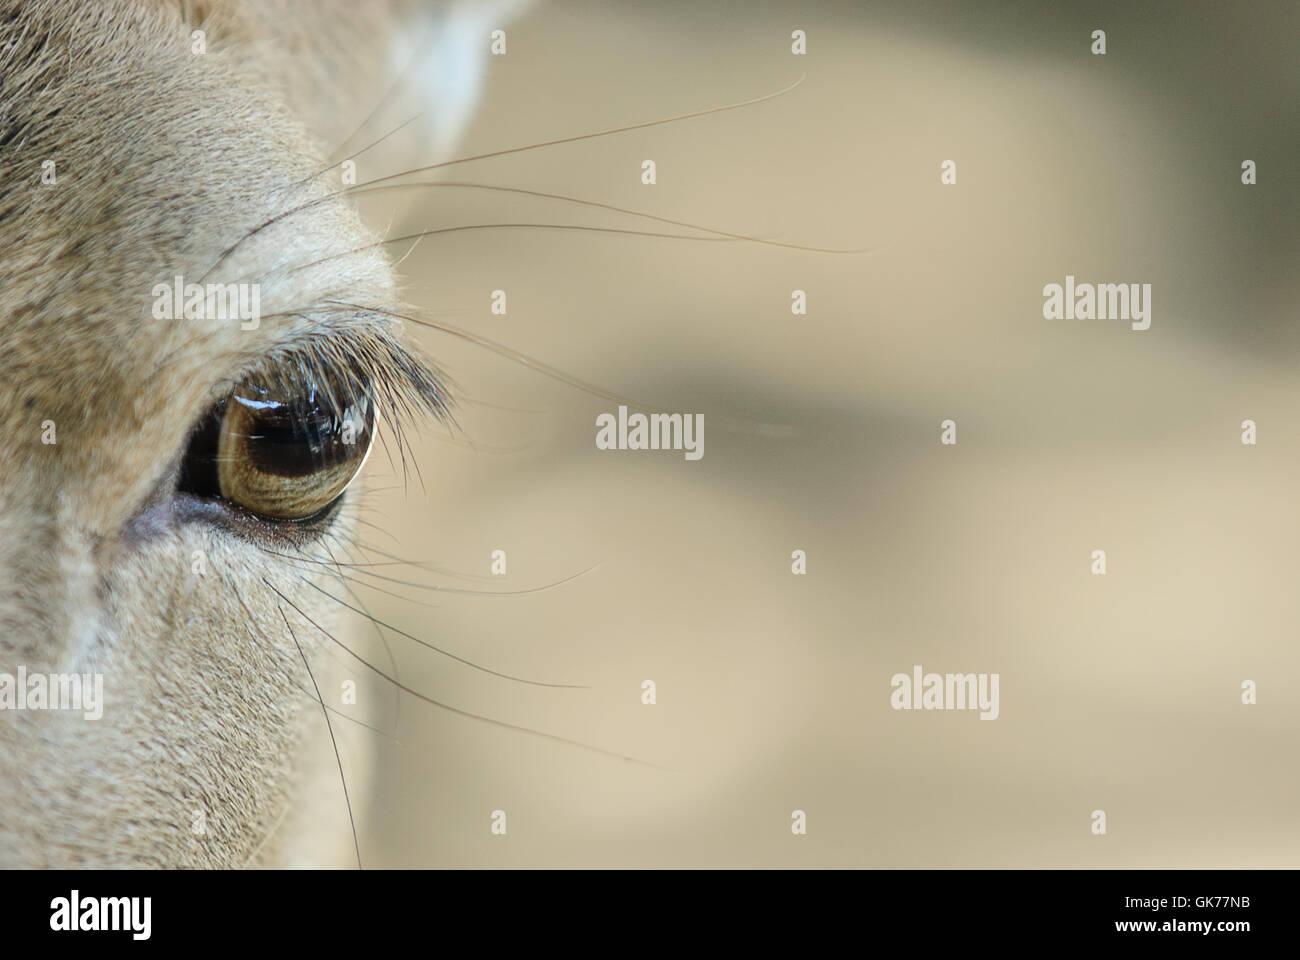 detail mammal mammals - Stock Image